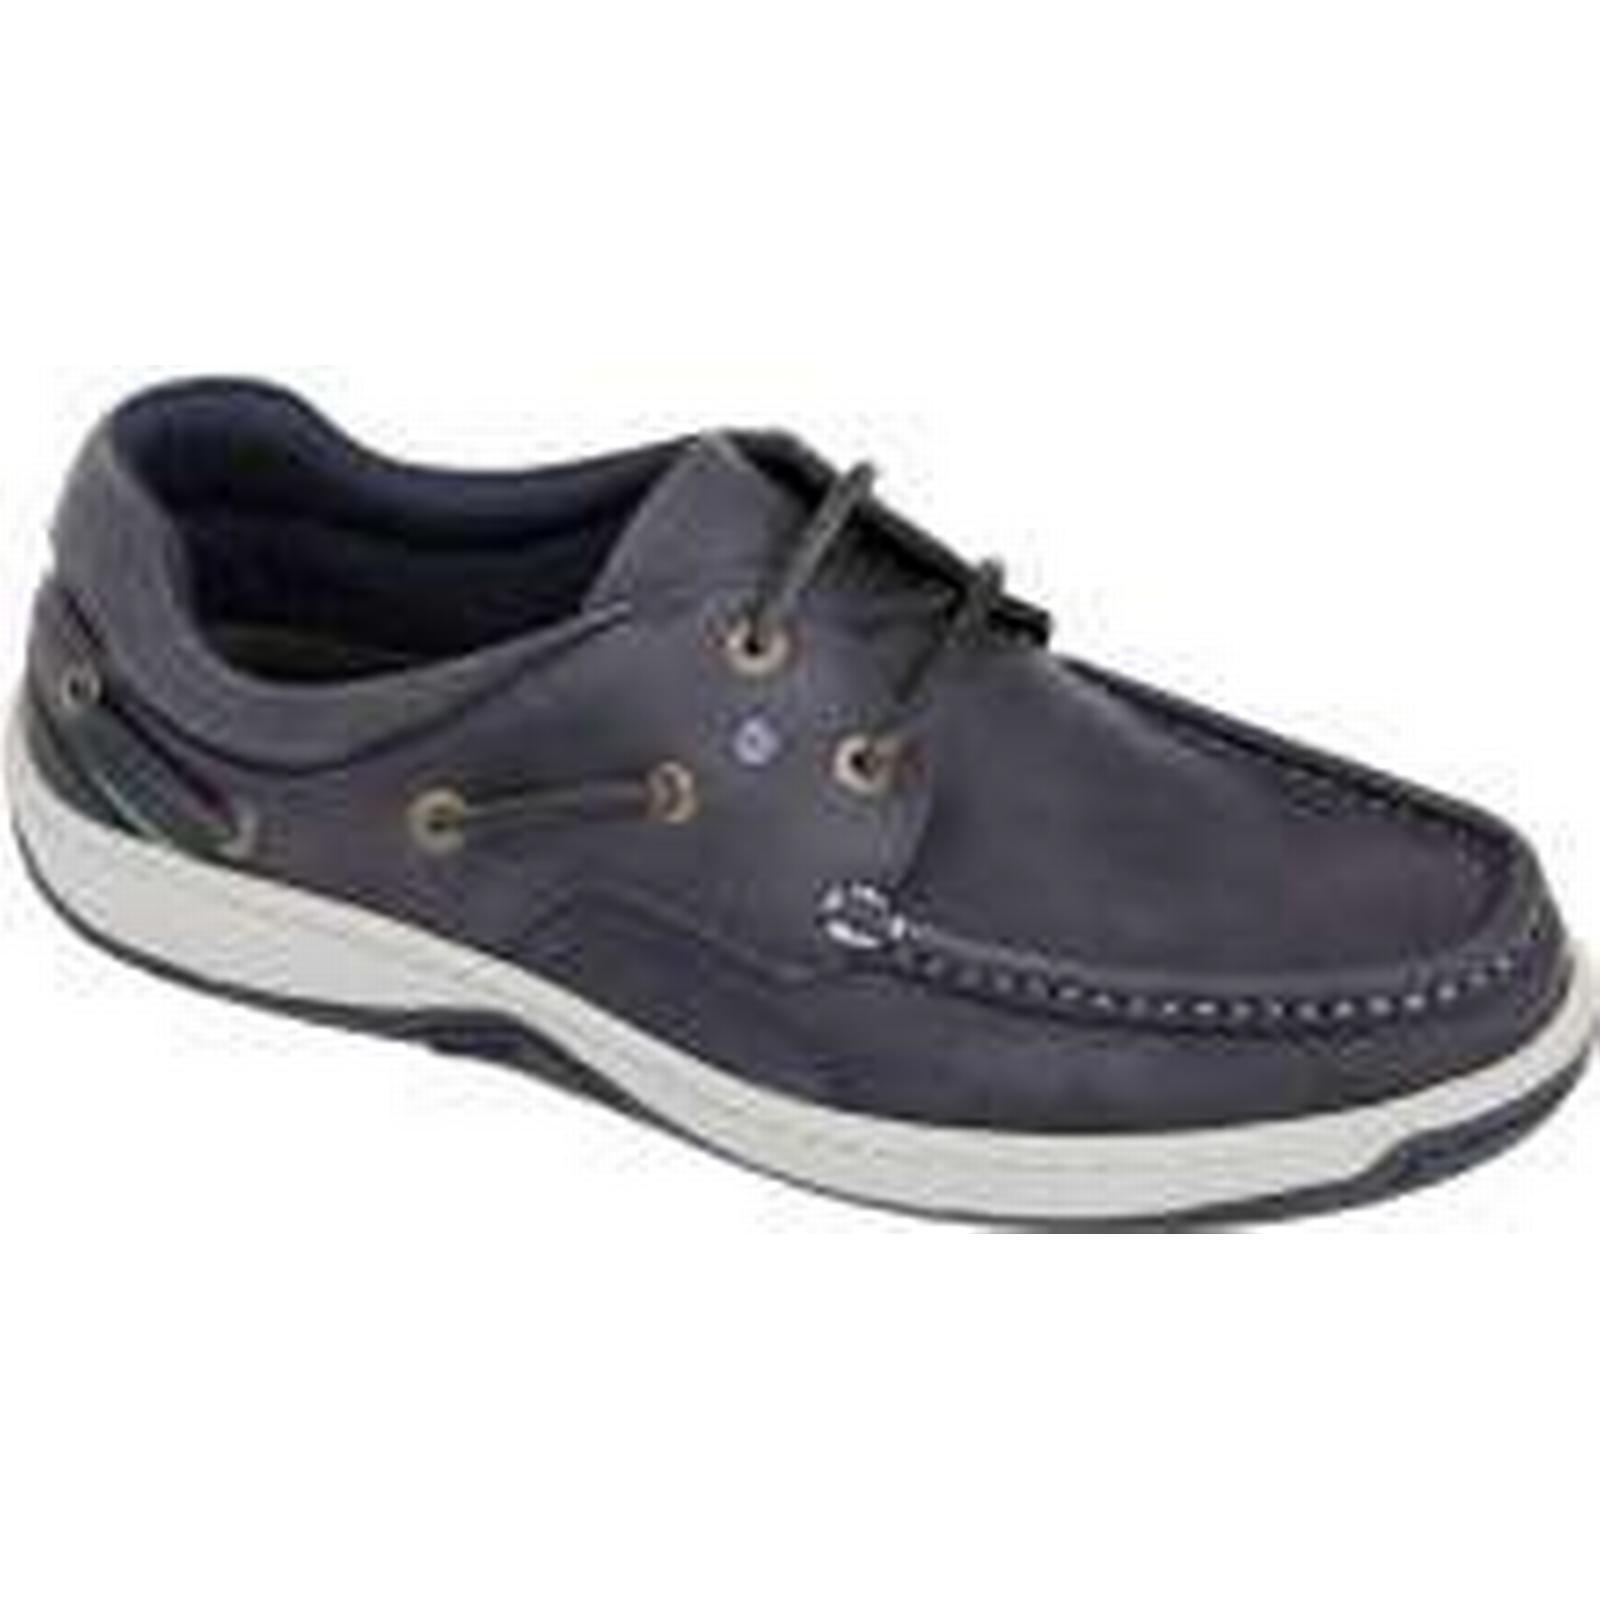 Dubarry UK10 Navigator Deck Shoes, Navy, UK10 Dubarry bf37a0